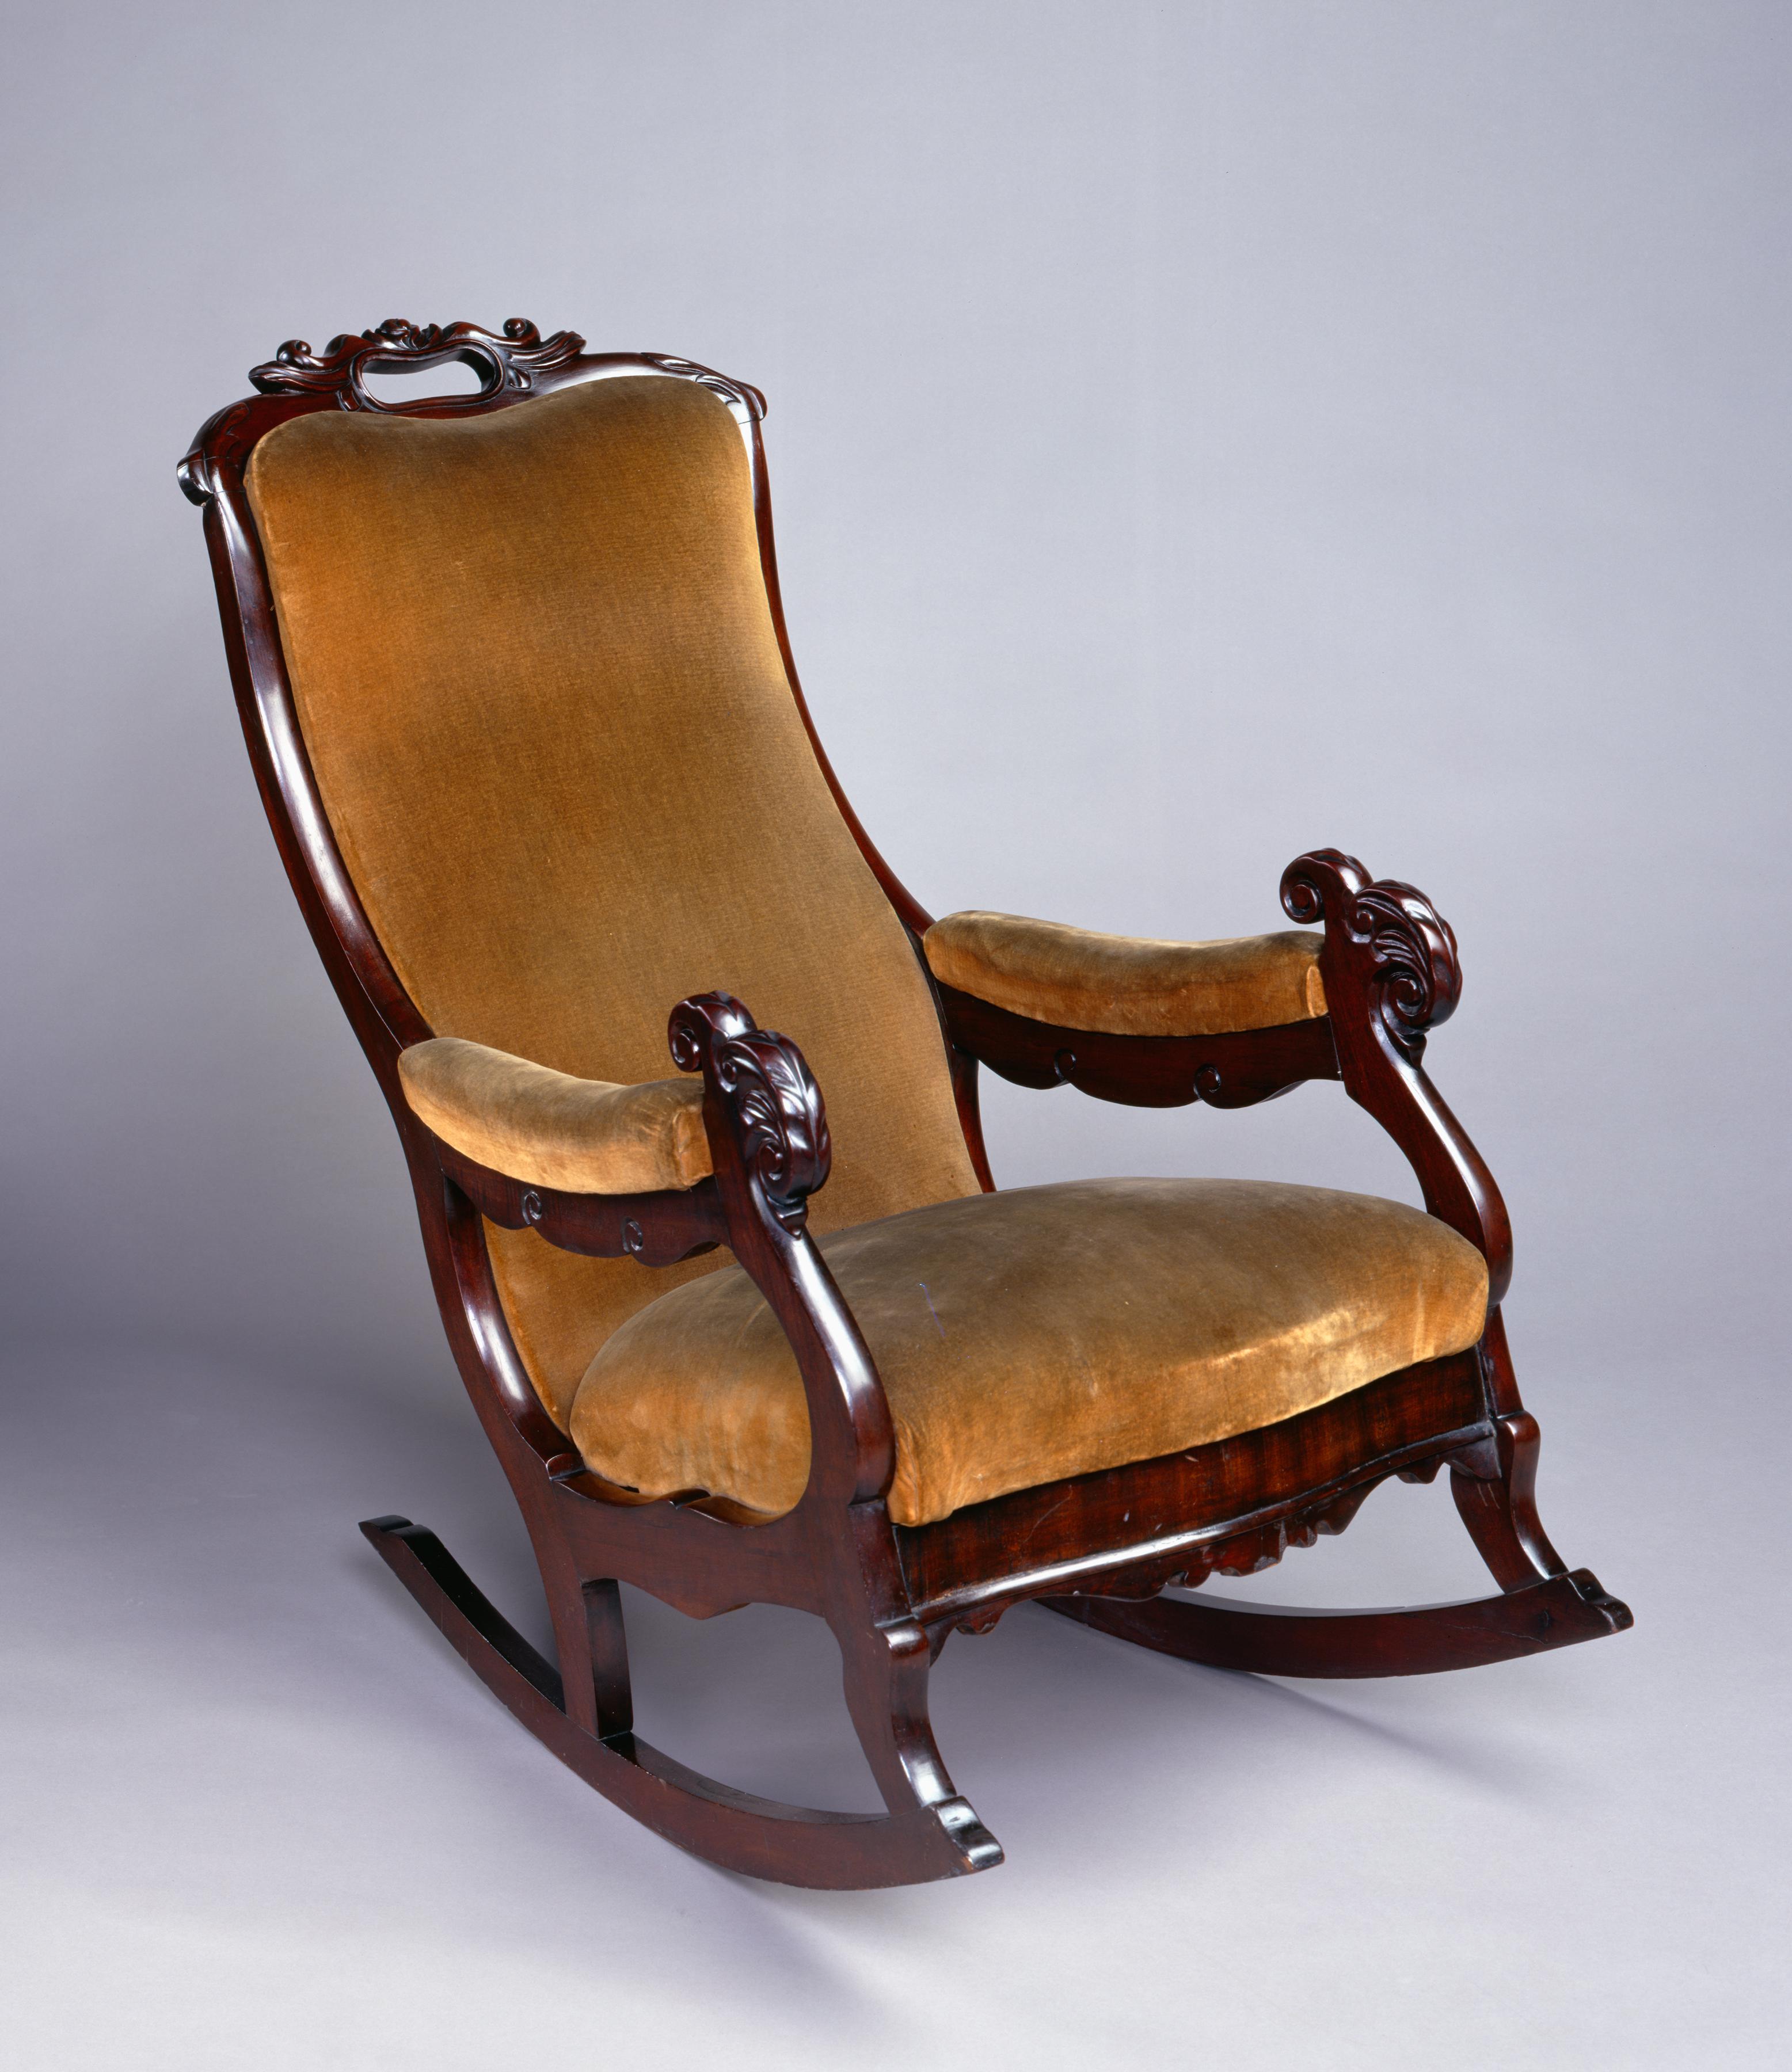 Thomas Day rocking chair